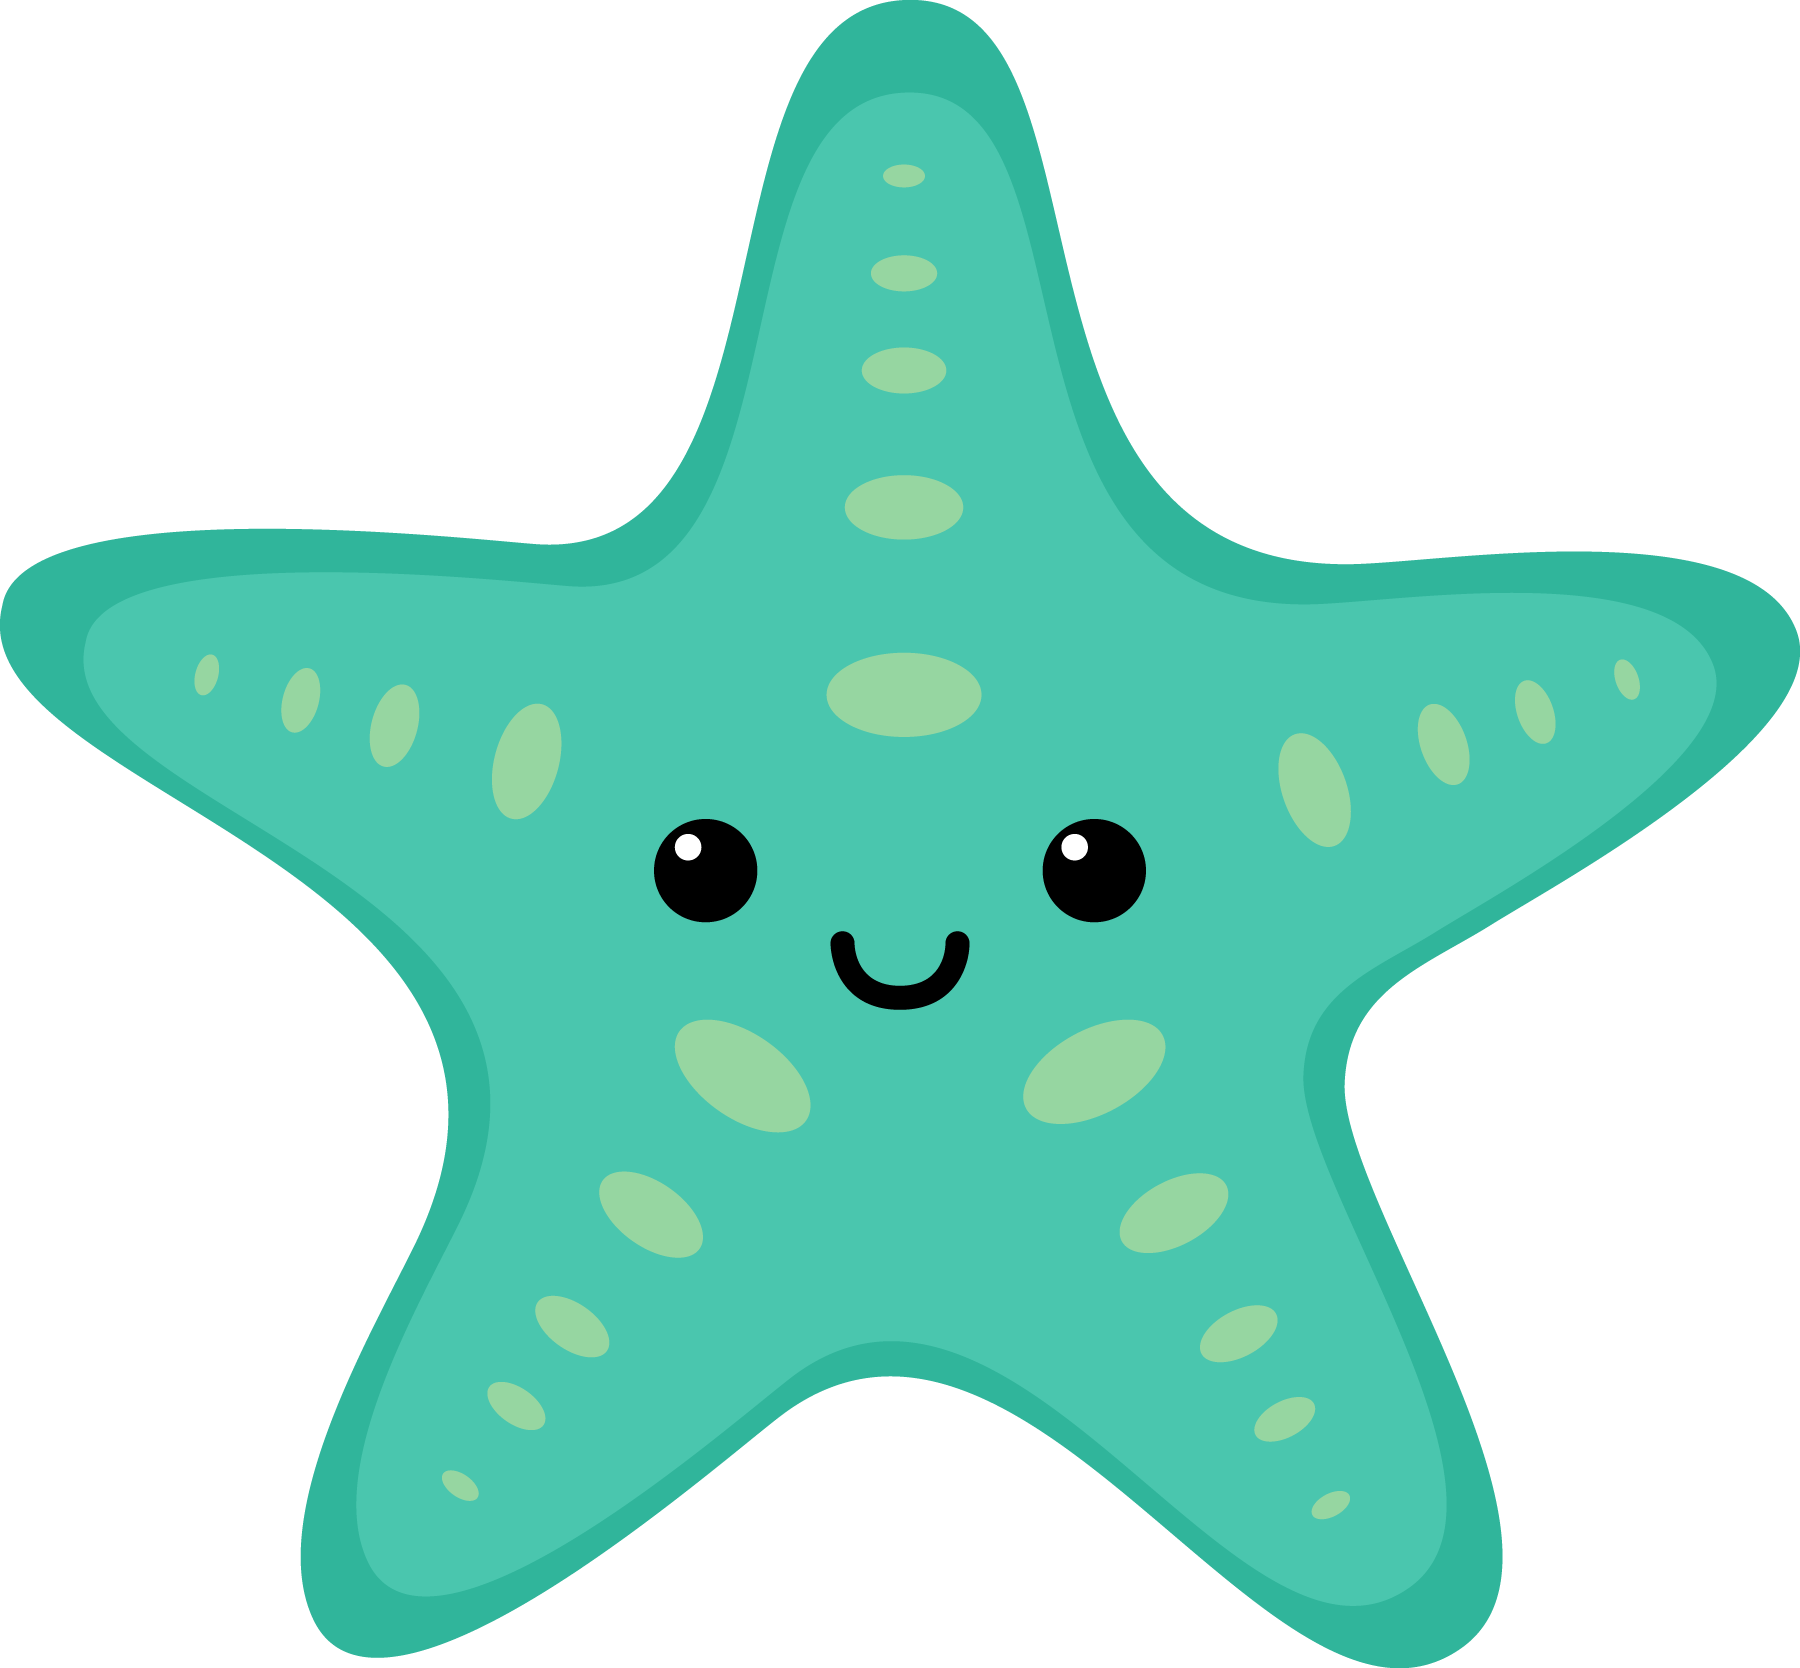 Pet clipart summer. Sea star at getdrawings